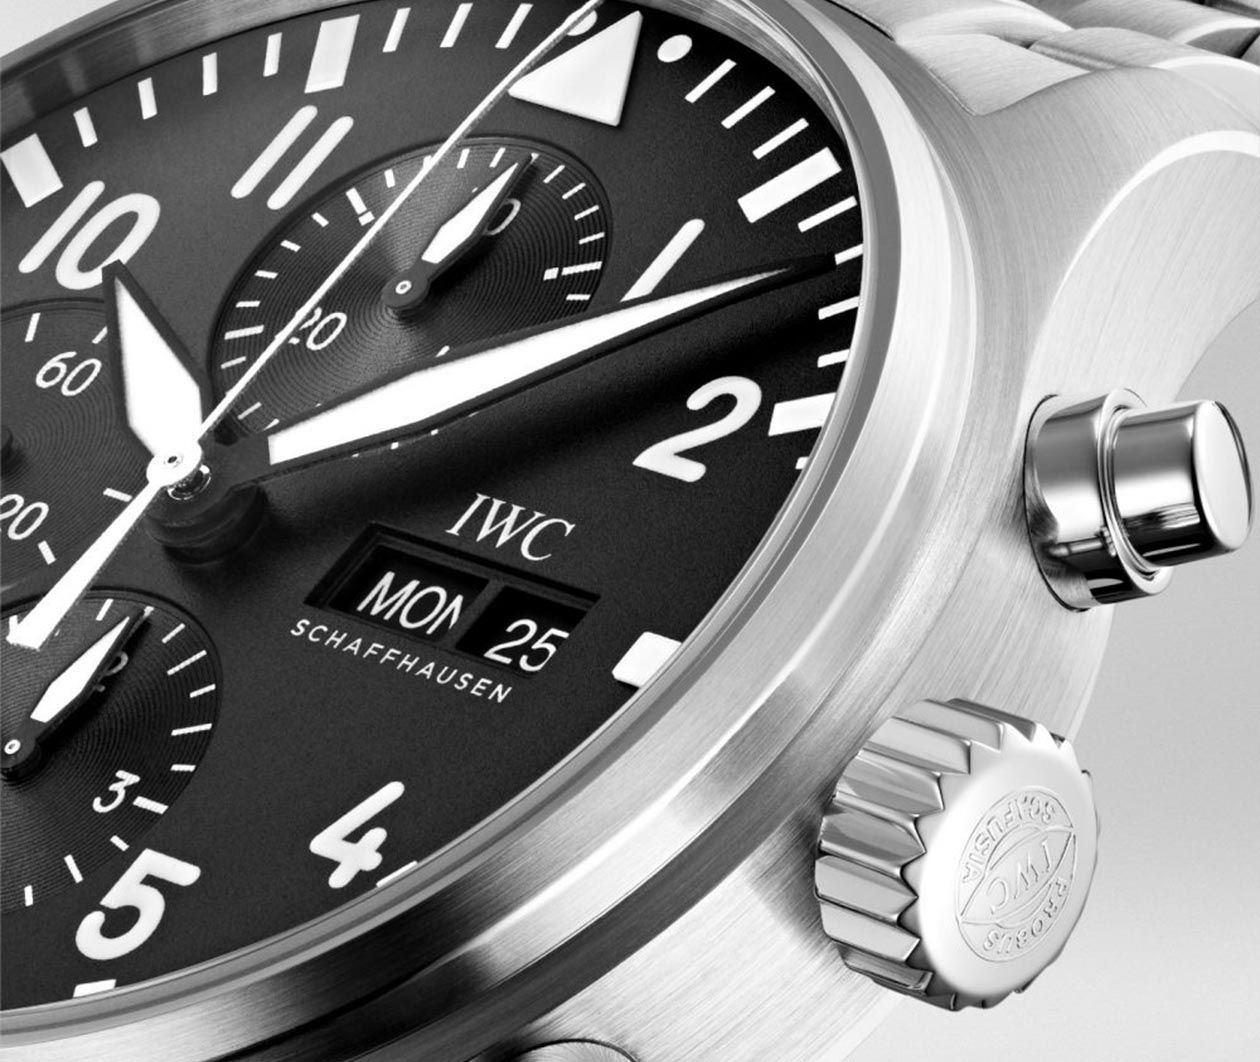 IWC PilotsWatch Chronograph IW377710 Carousel 4 FINAL